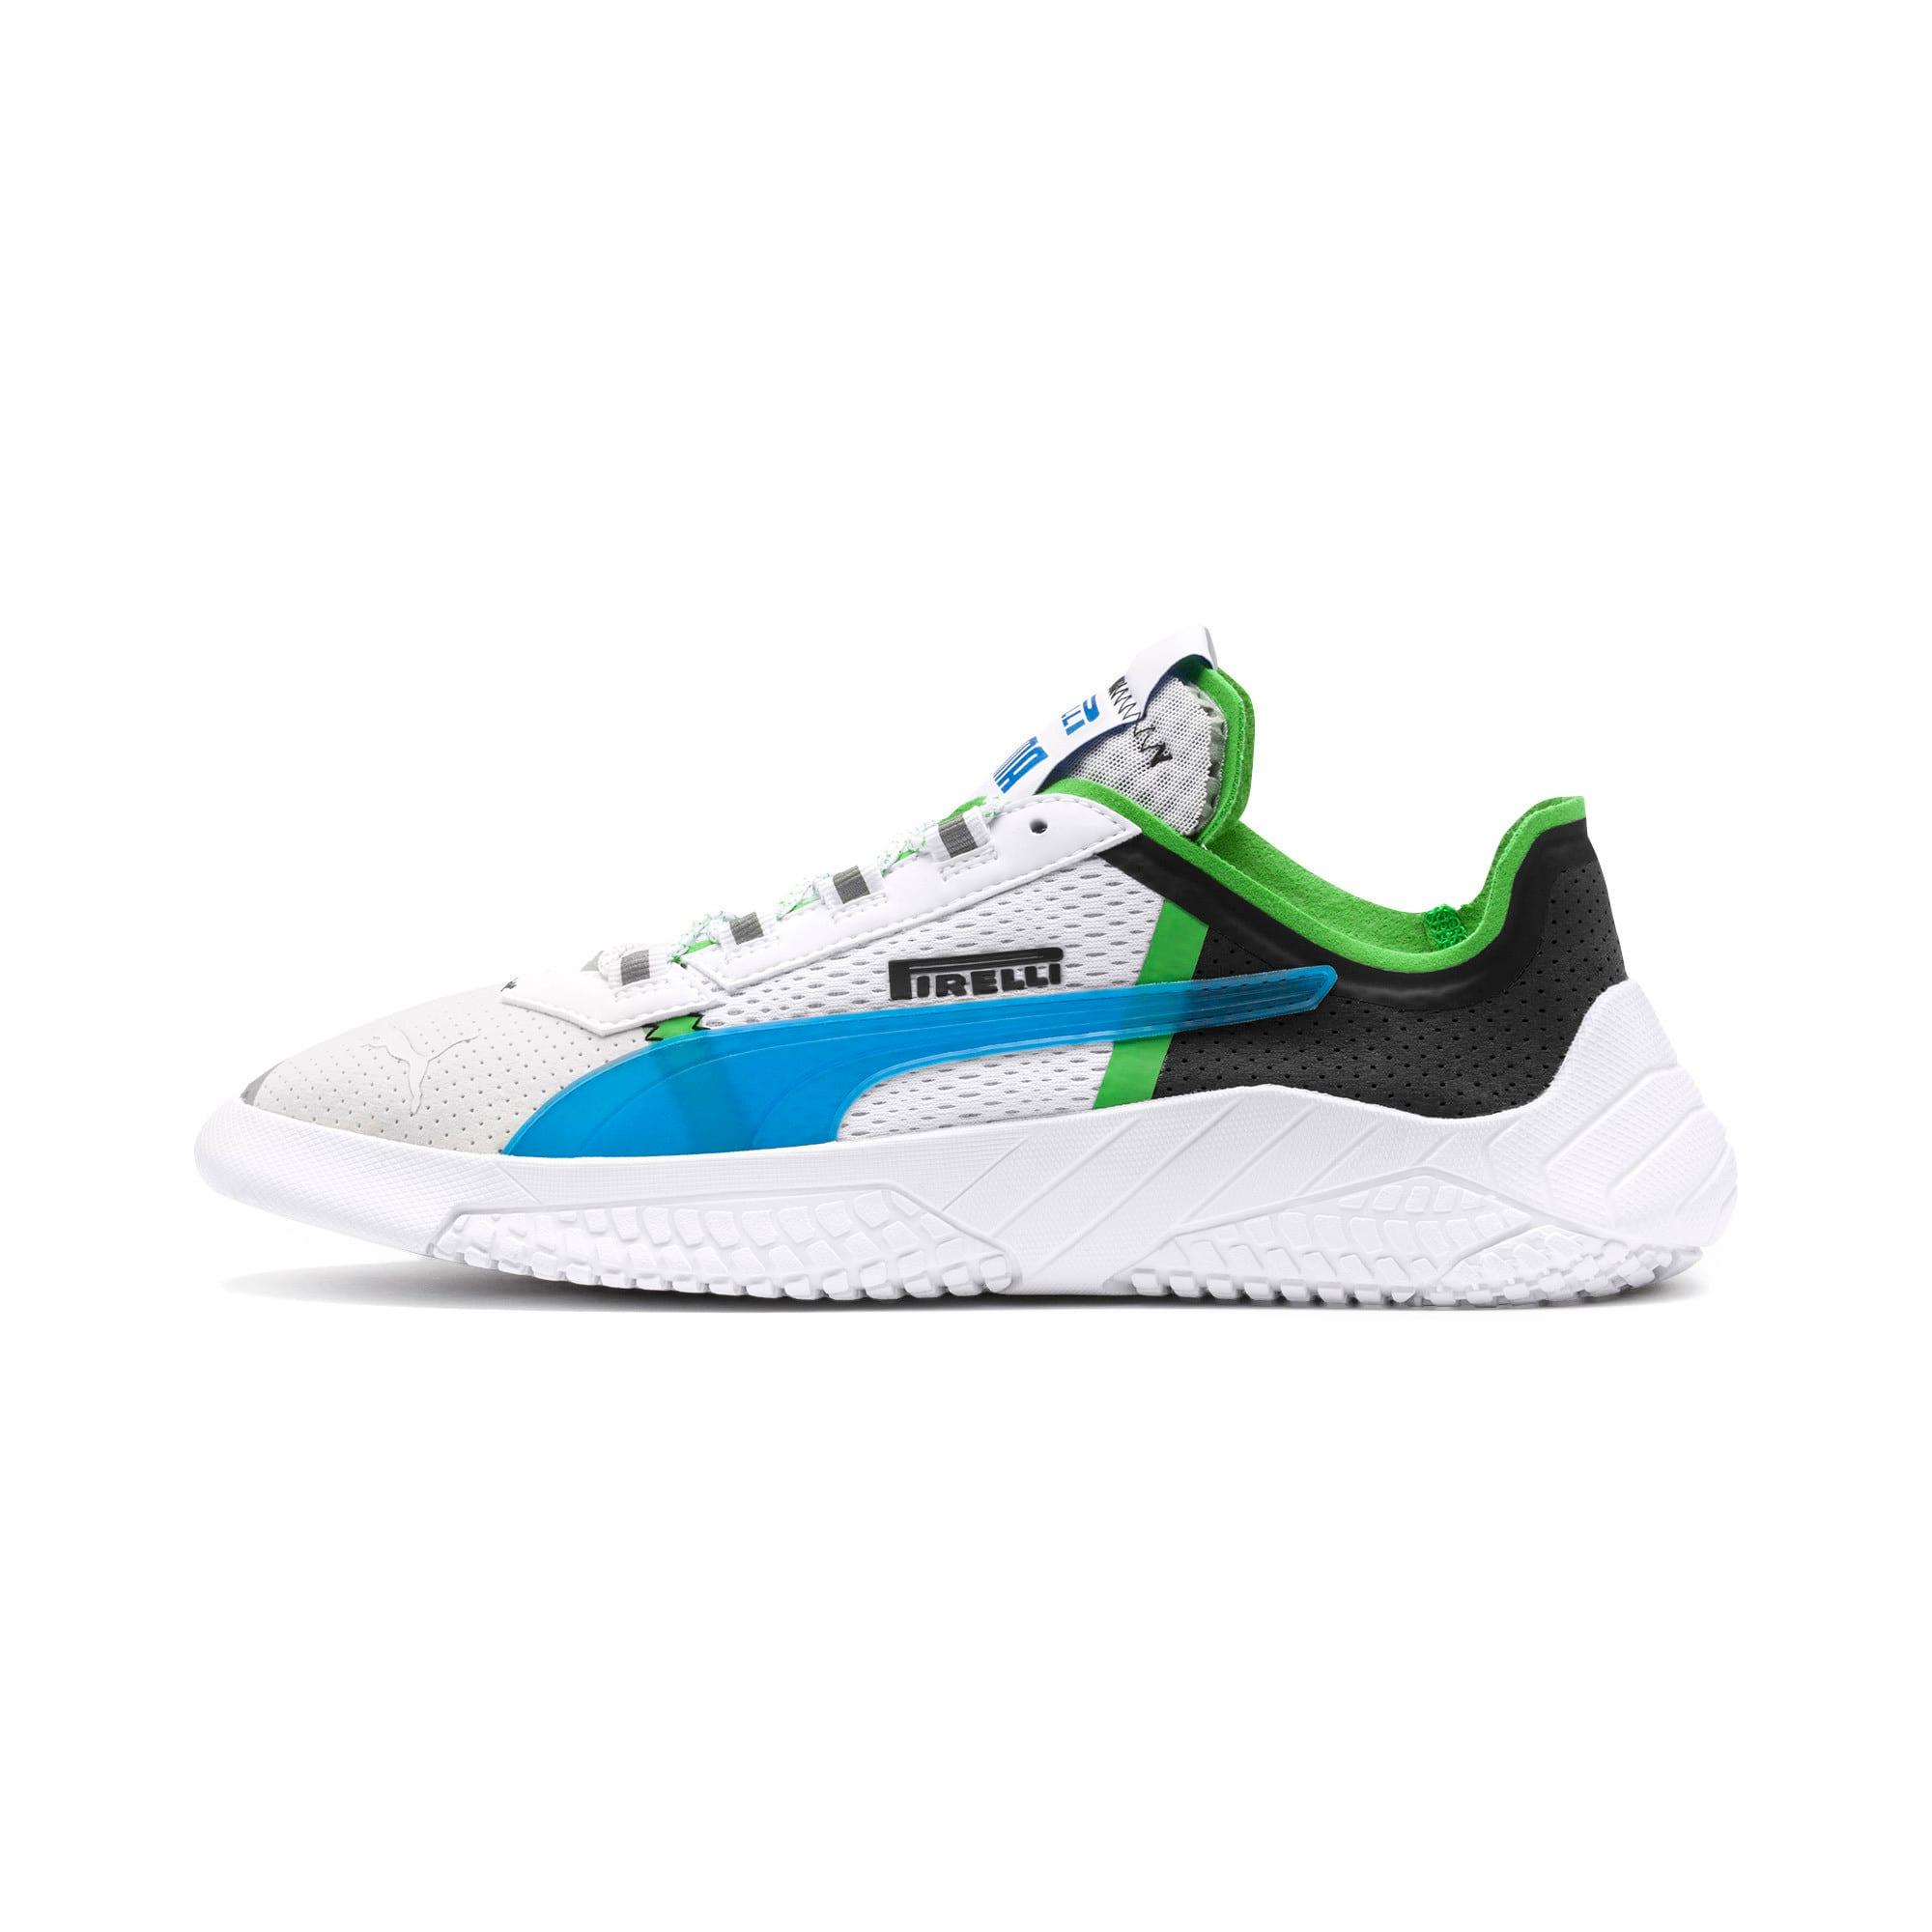 Thumbnail 1 of Replicat-X Pirelli Motorsport Shoes, White-Black-Classic Green, medium